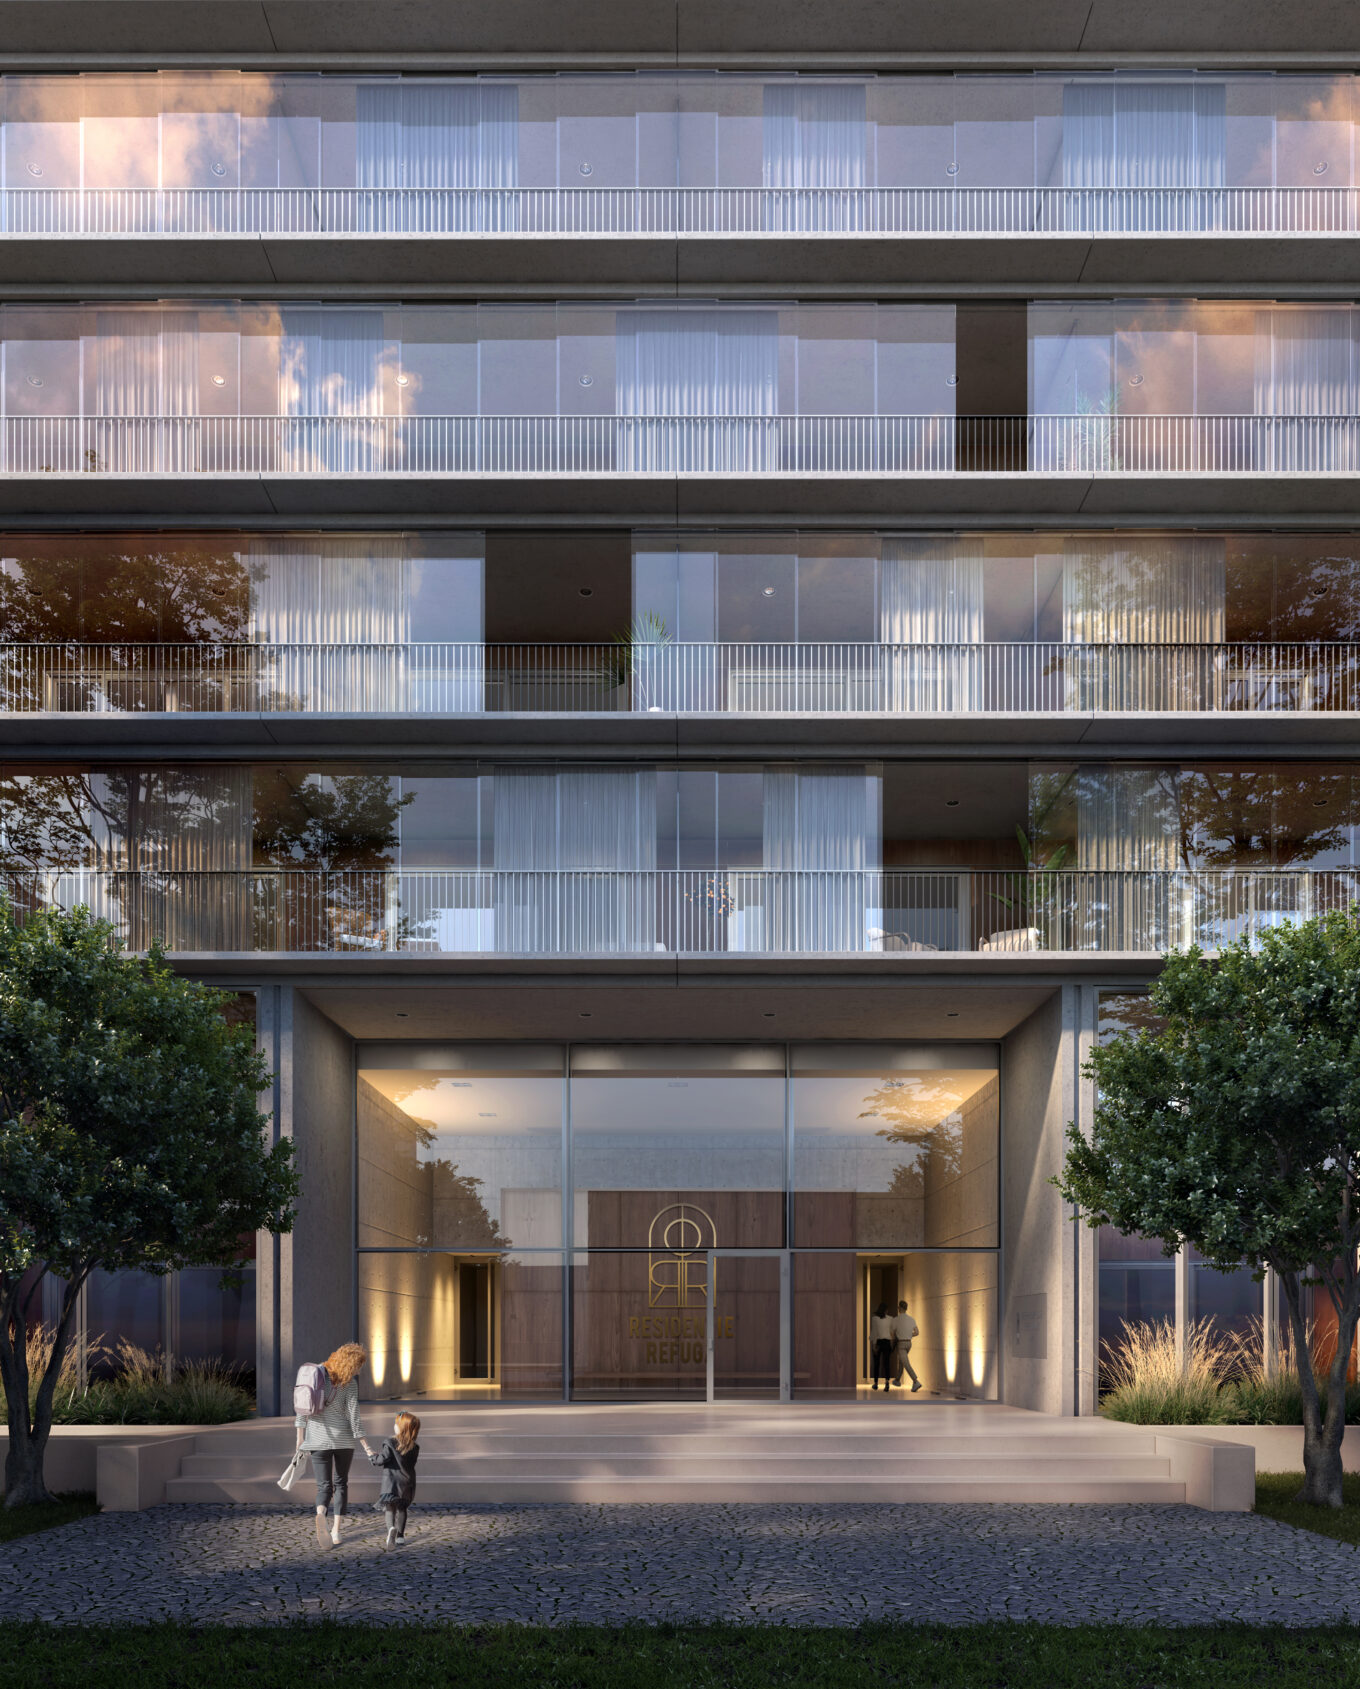 7655 kolmont refuga images exterior C5 Urban Villa final